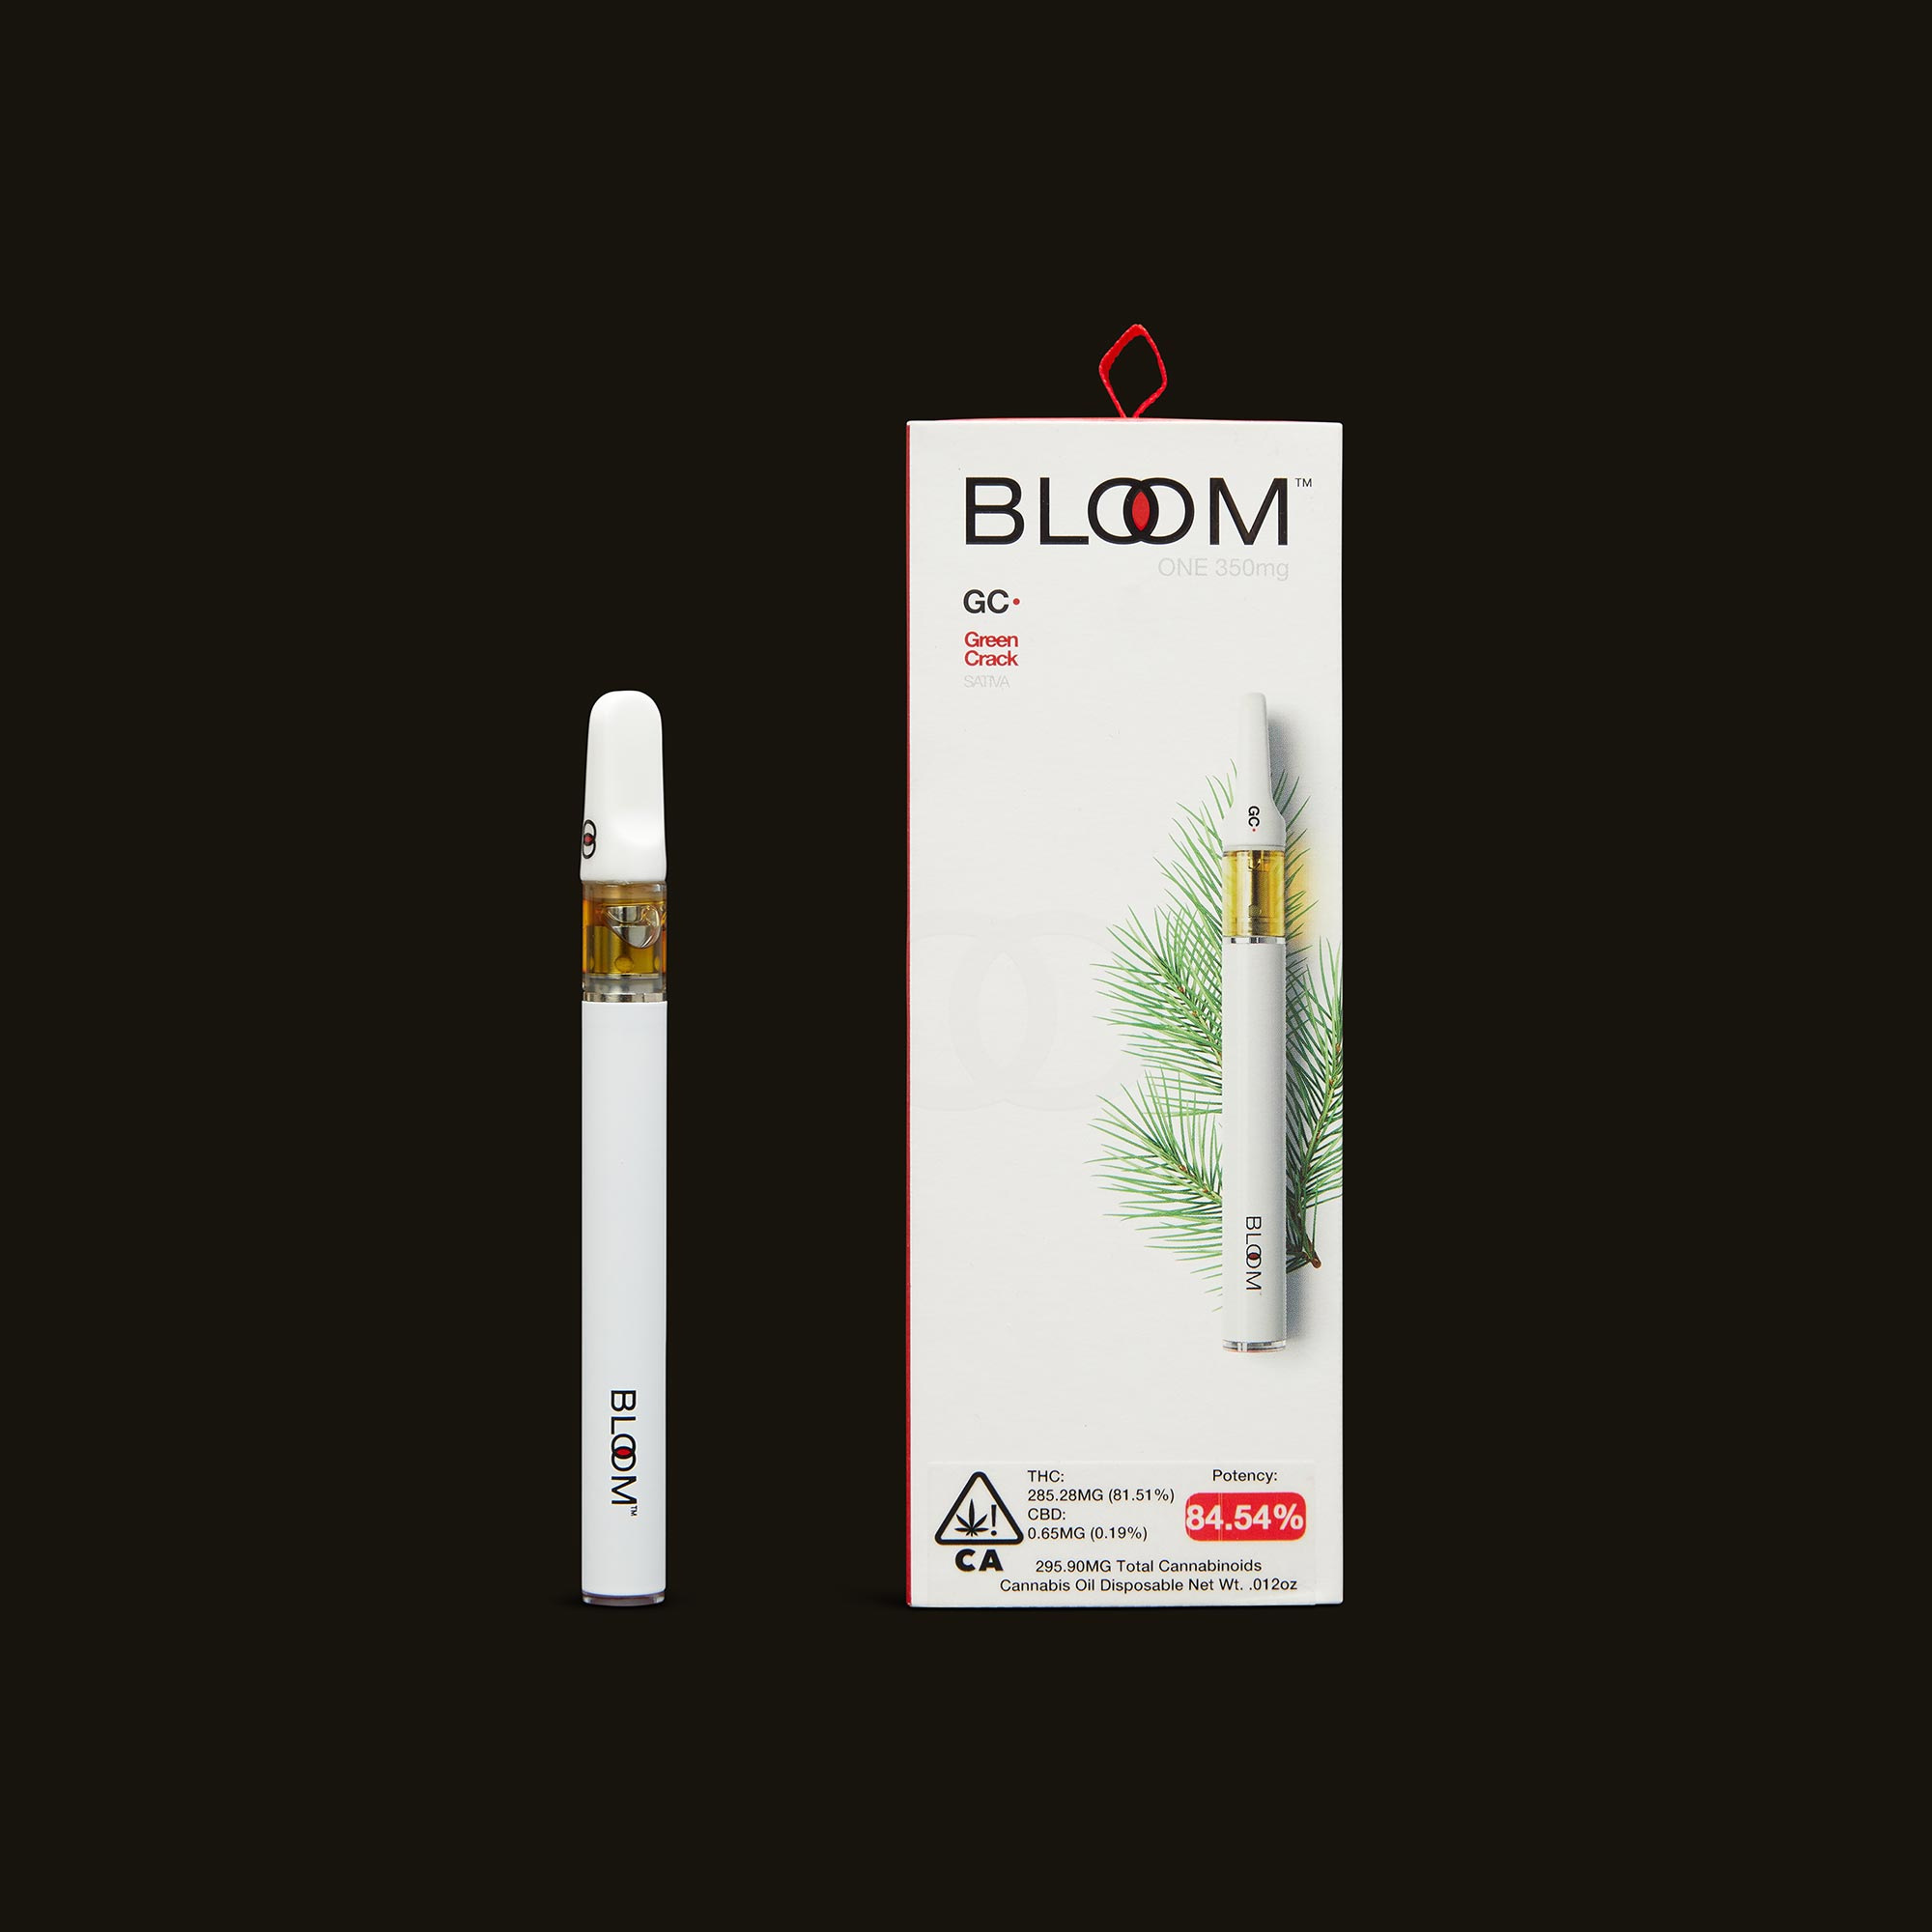 Bloom Brands Green Crack Bloom One